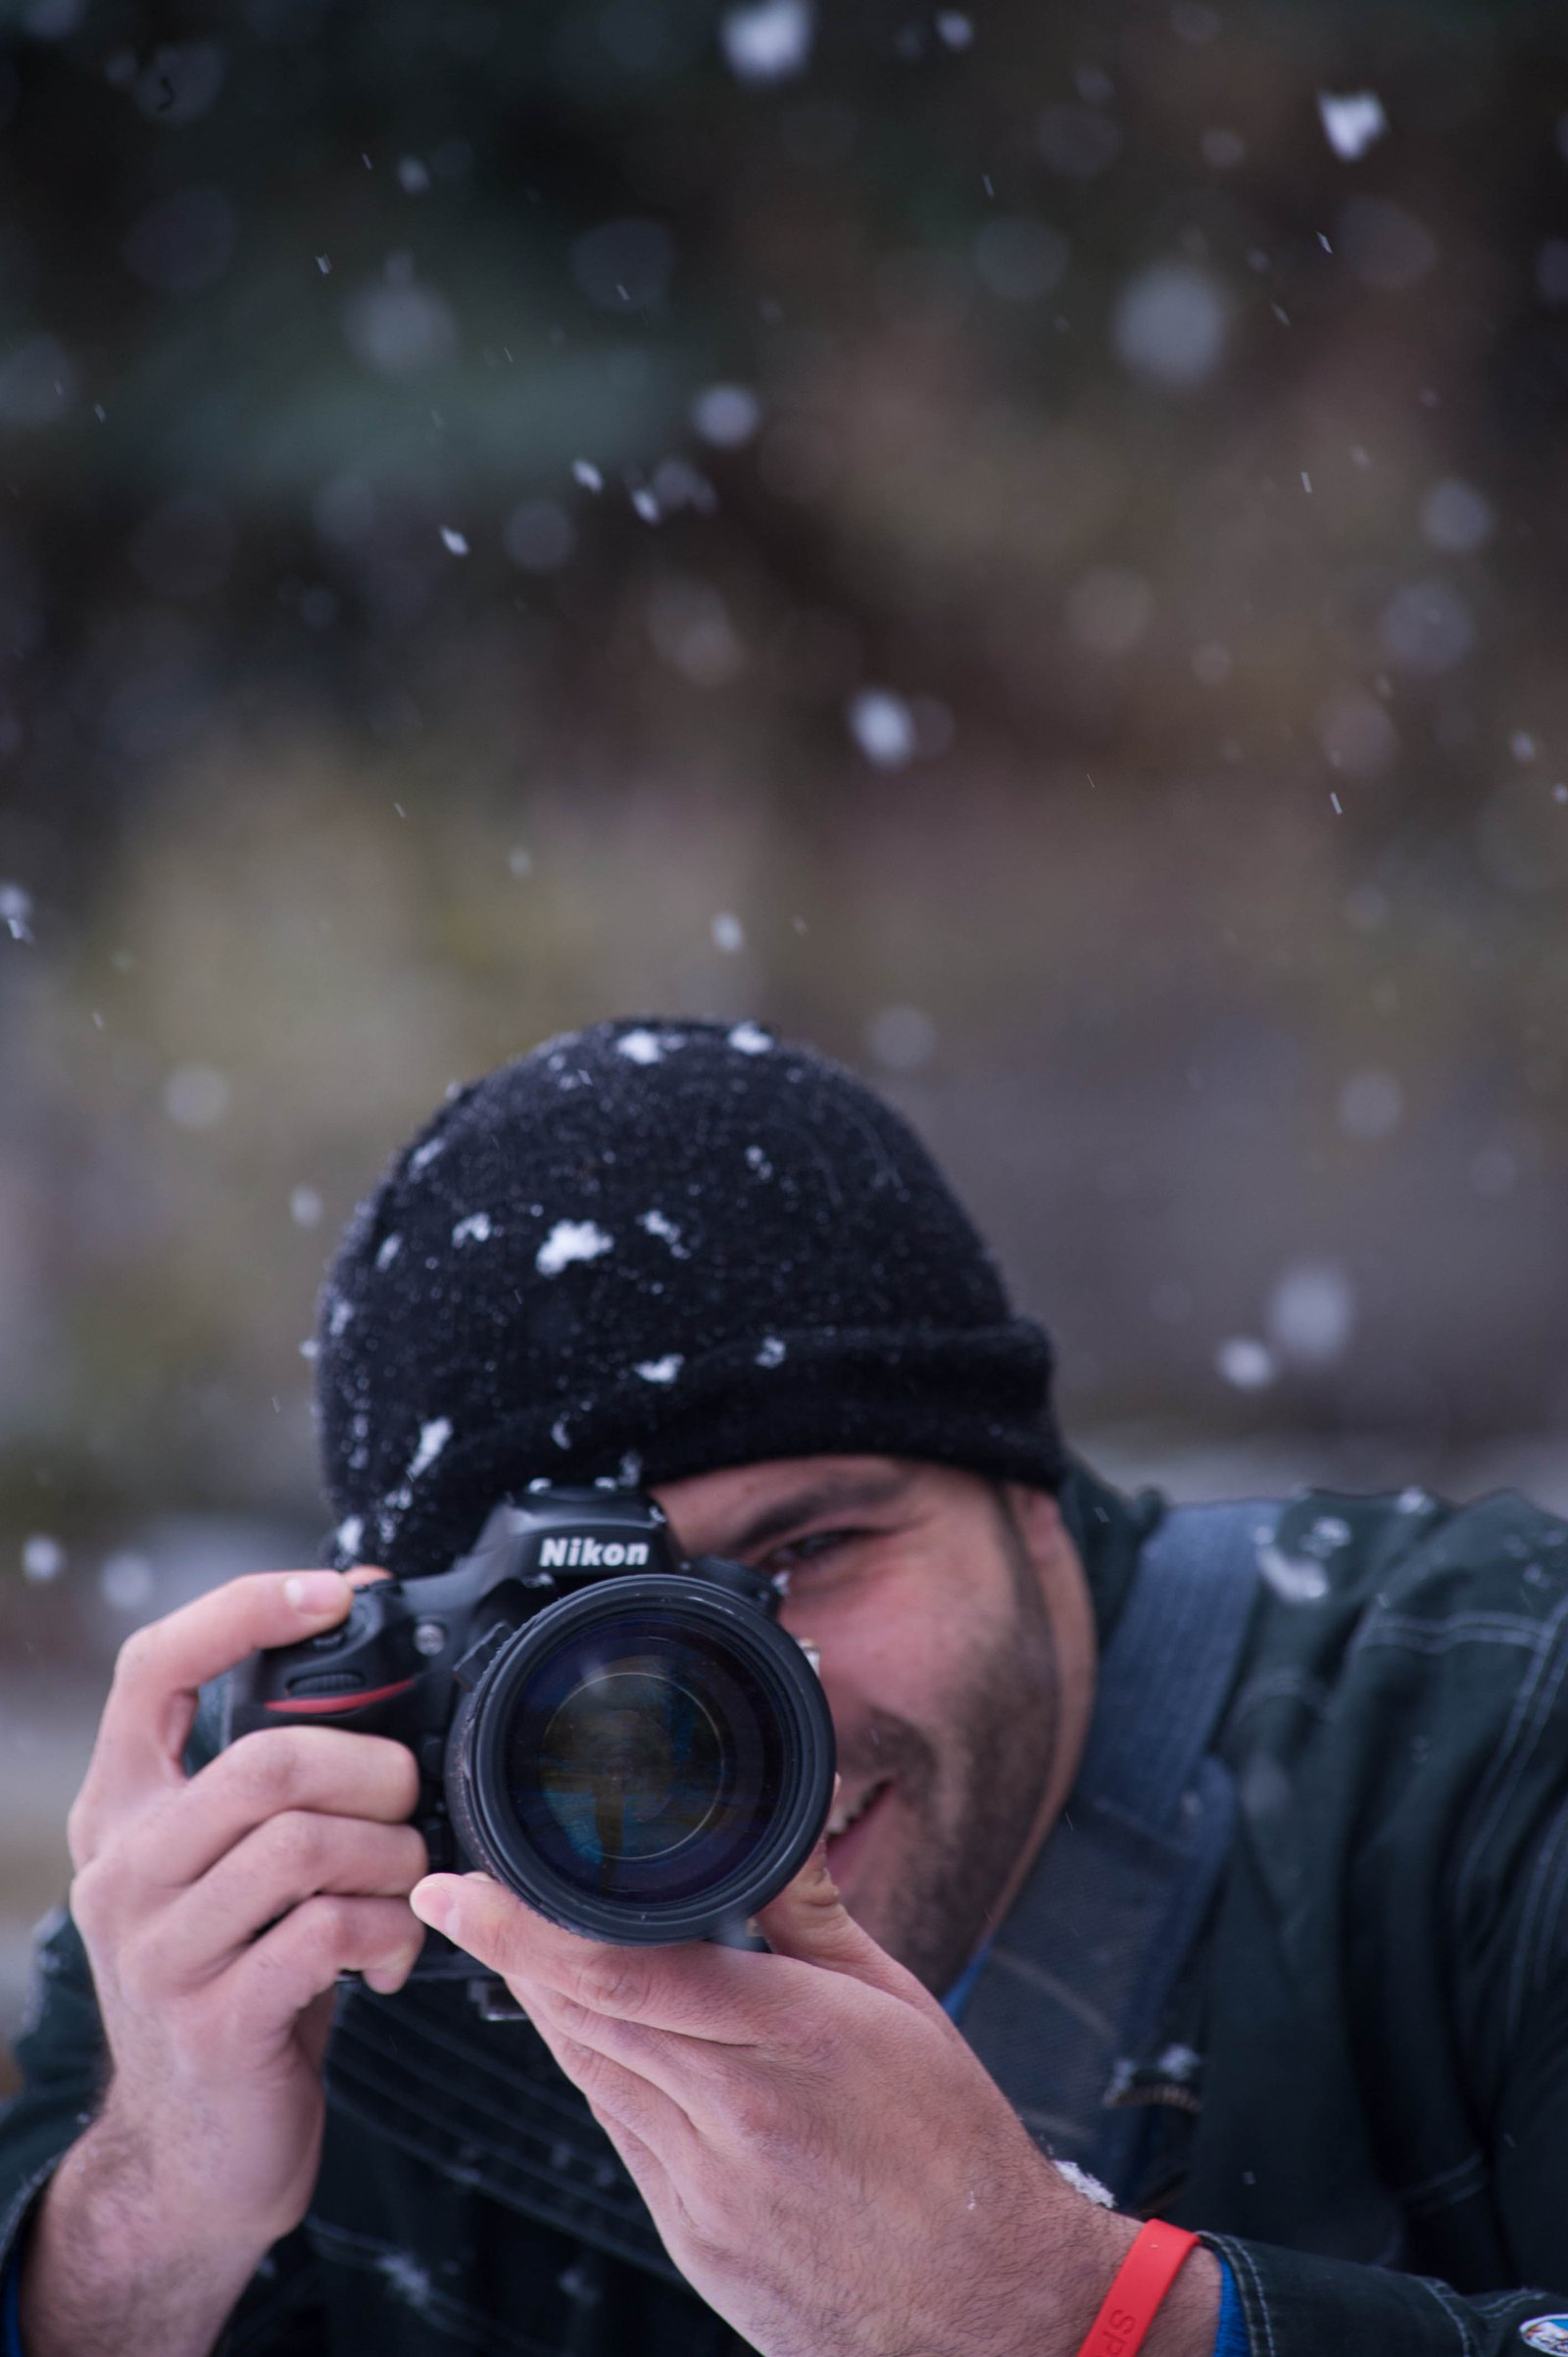 Photographer sighting